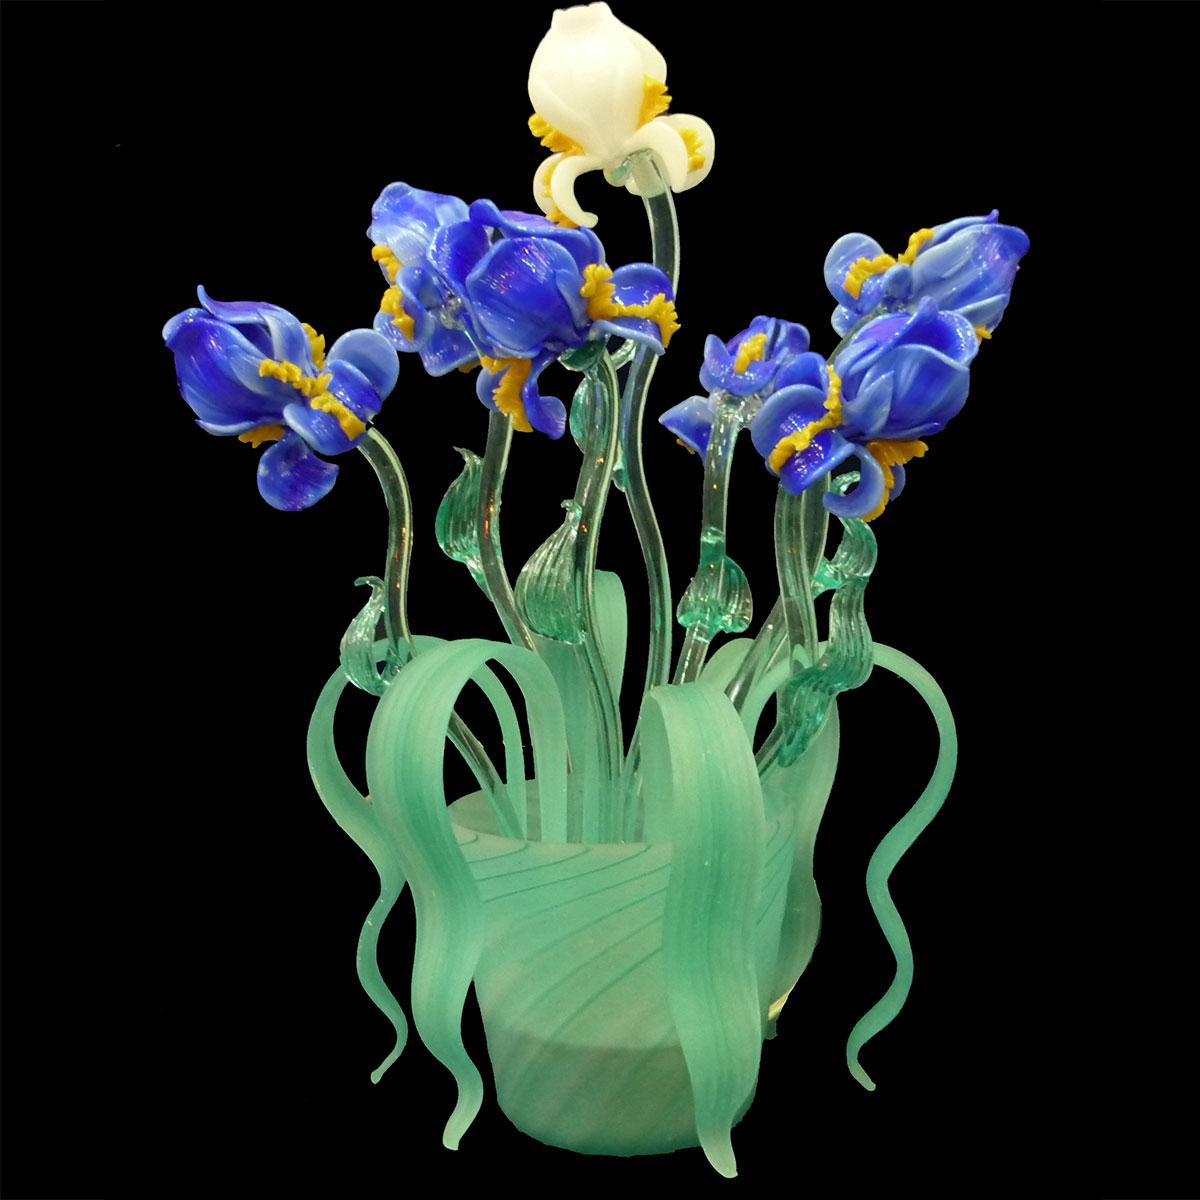 """Iris Blu"" lampe de chevet en verre de Murano - 2 lumières - bleu"